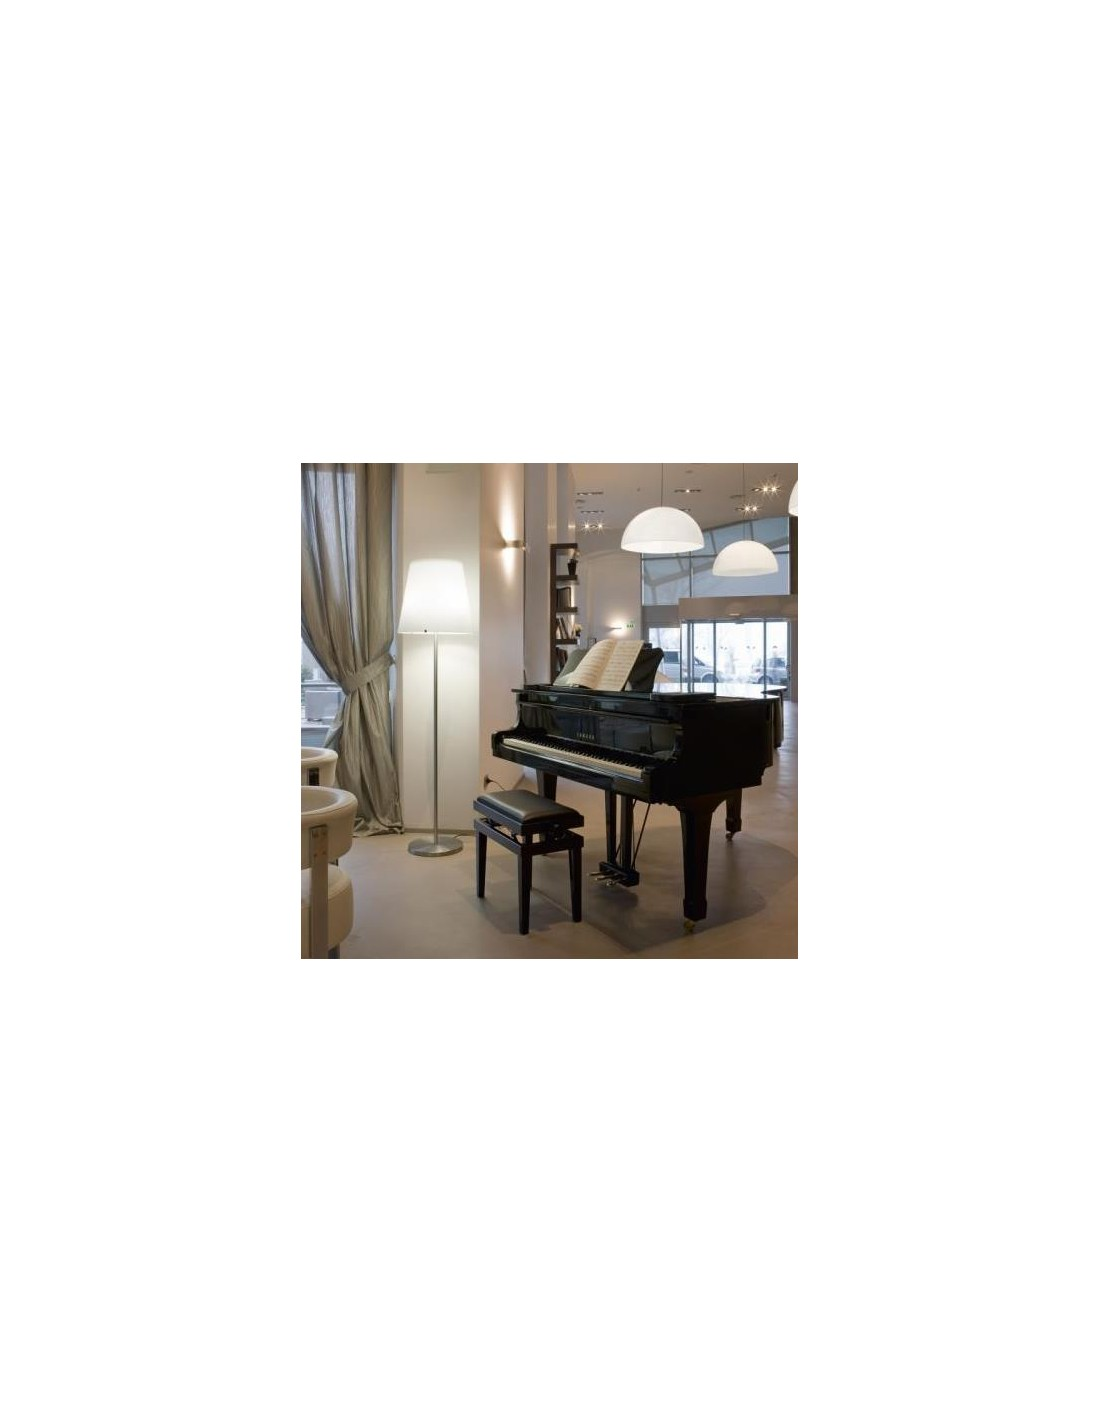 lampadaire 3247 grand mod le mise en sc ne salon fontana arte. Black Bedroom Furniture Sets. Home Design Ideas